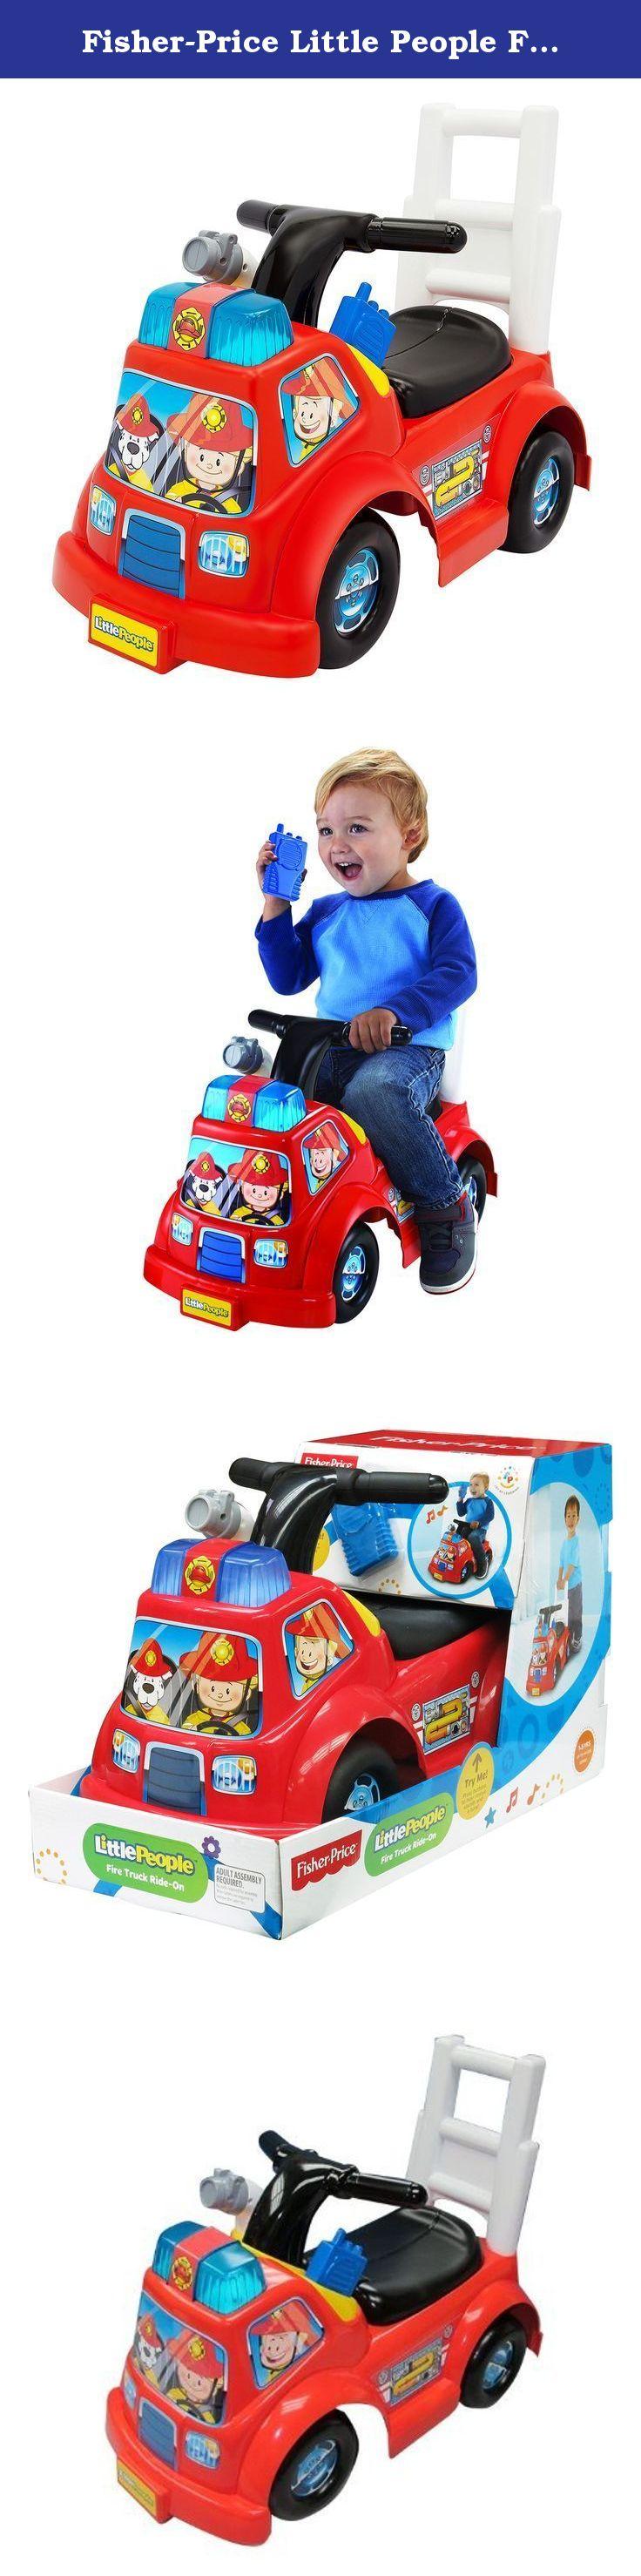 Little people car toys  FisherPrice Little People Fire Truck Ride On The Little People